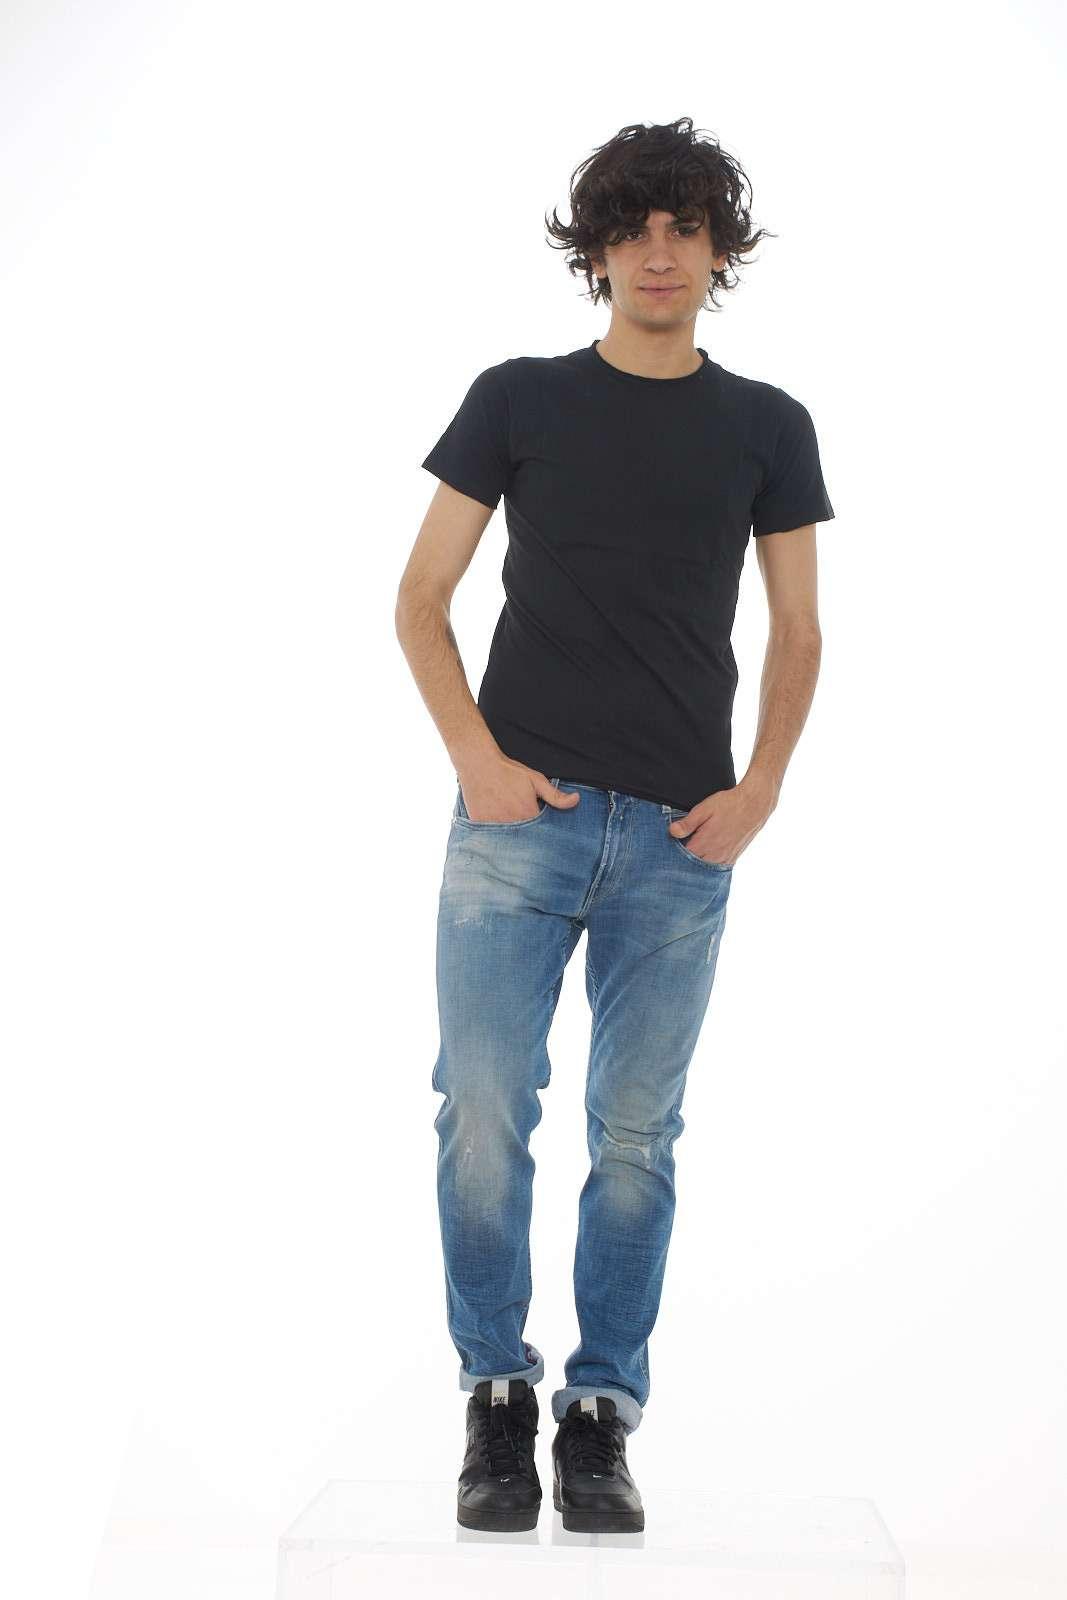 https://www.parmax.com/media/catalog/product/a/i/PE-outlet_parmax-t-shirt-donna-Replay-M3590-D.jpg